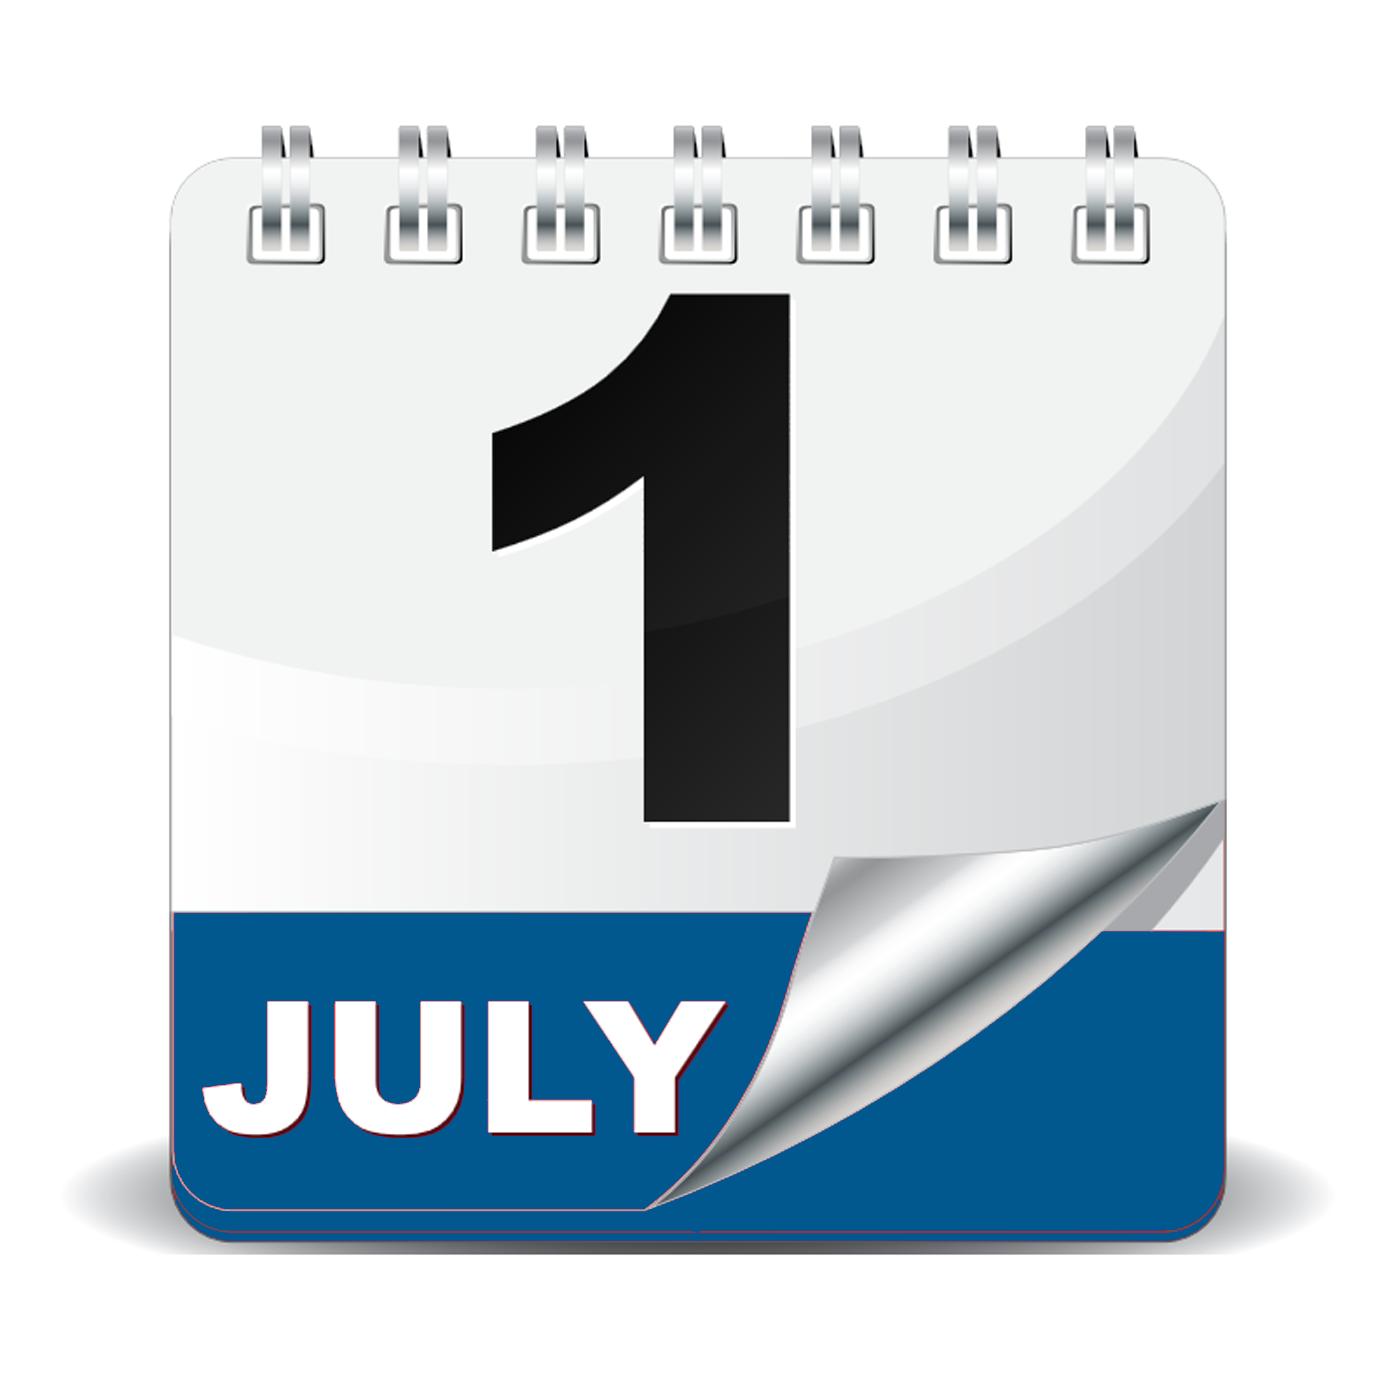 Tax Season 2014 Is Now Open! Durban Accountants